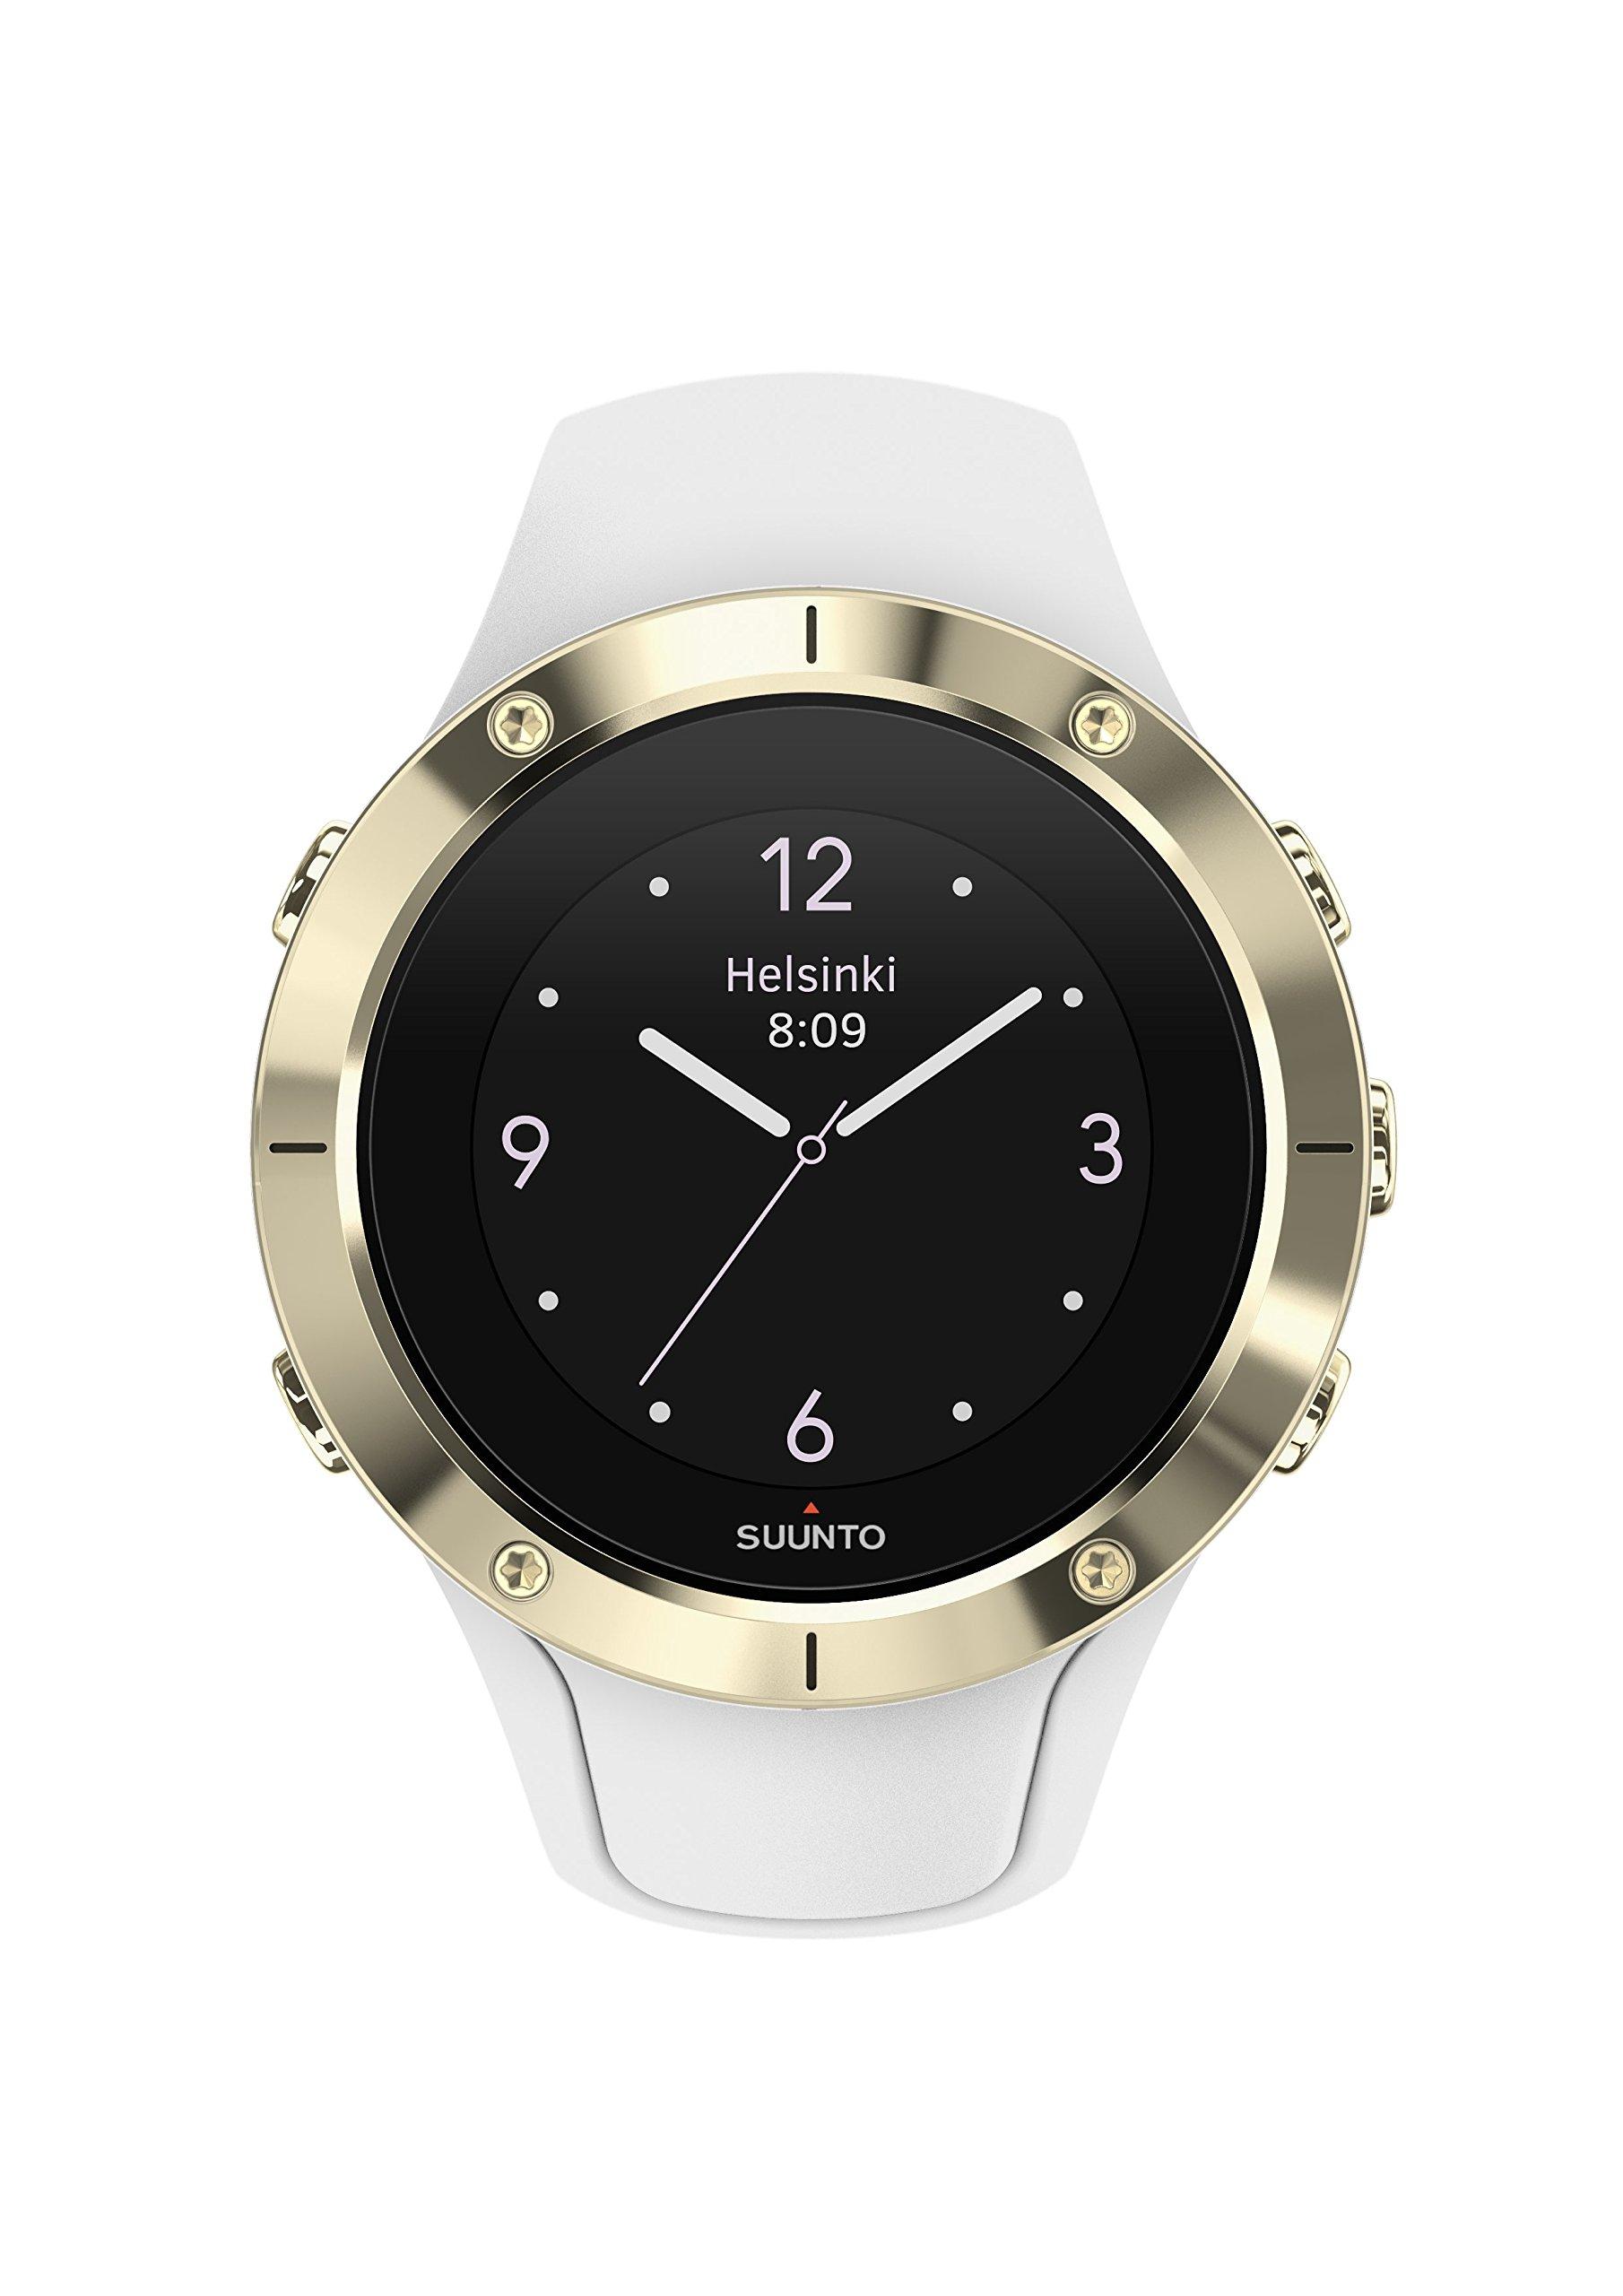 Suunto Spartan Trainer Wrist HR Multisport GPS Watch (Gold) by Suunto (Image #8)